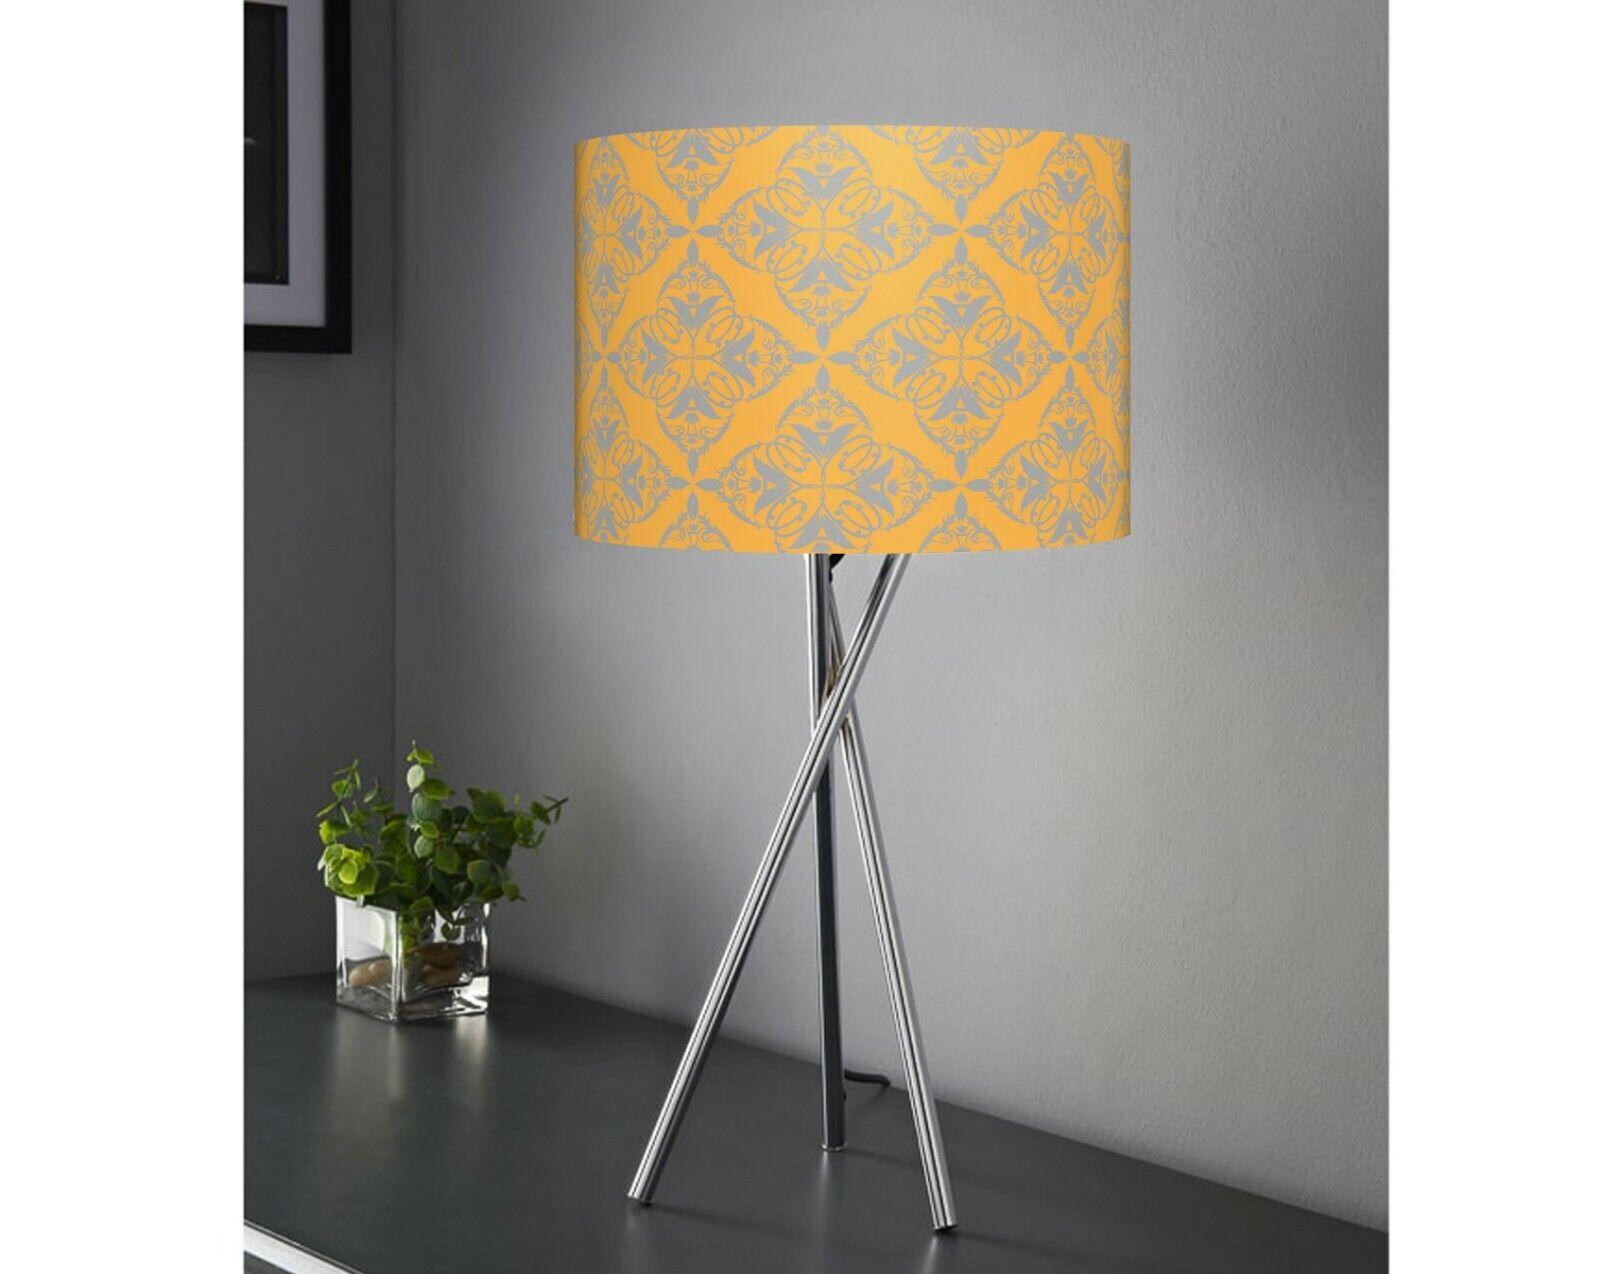 Bedside Table Lamp Tripod Lamp Mustard grau Fabric Shade